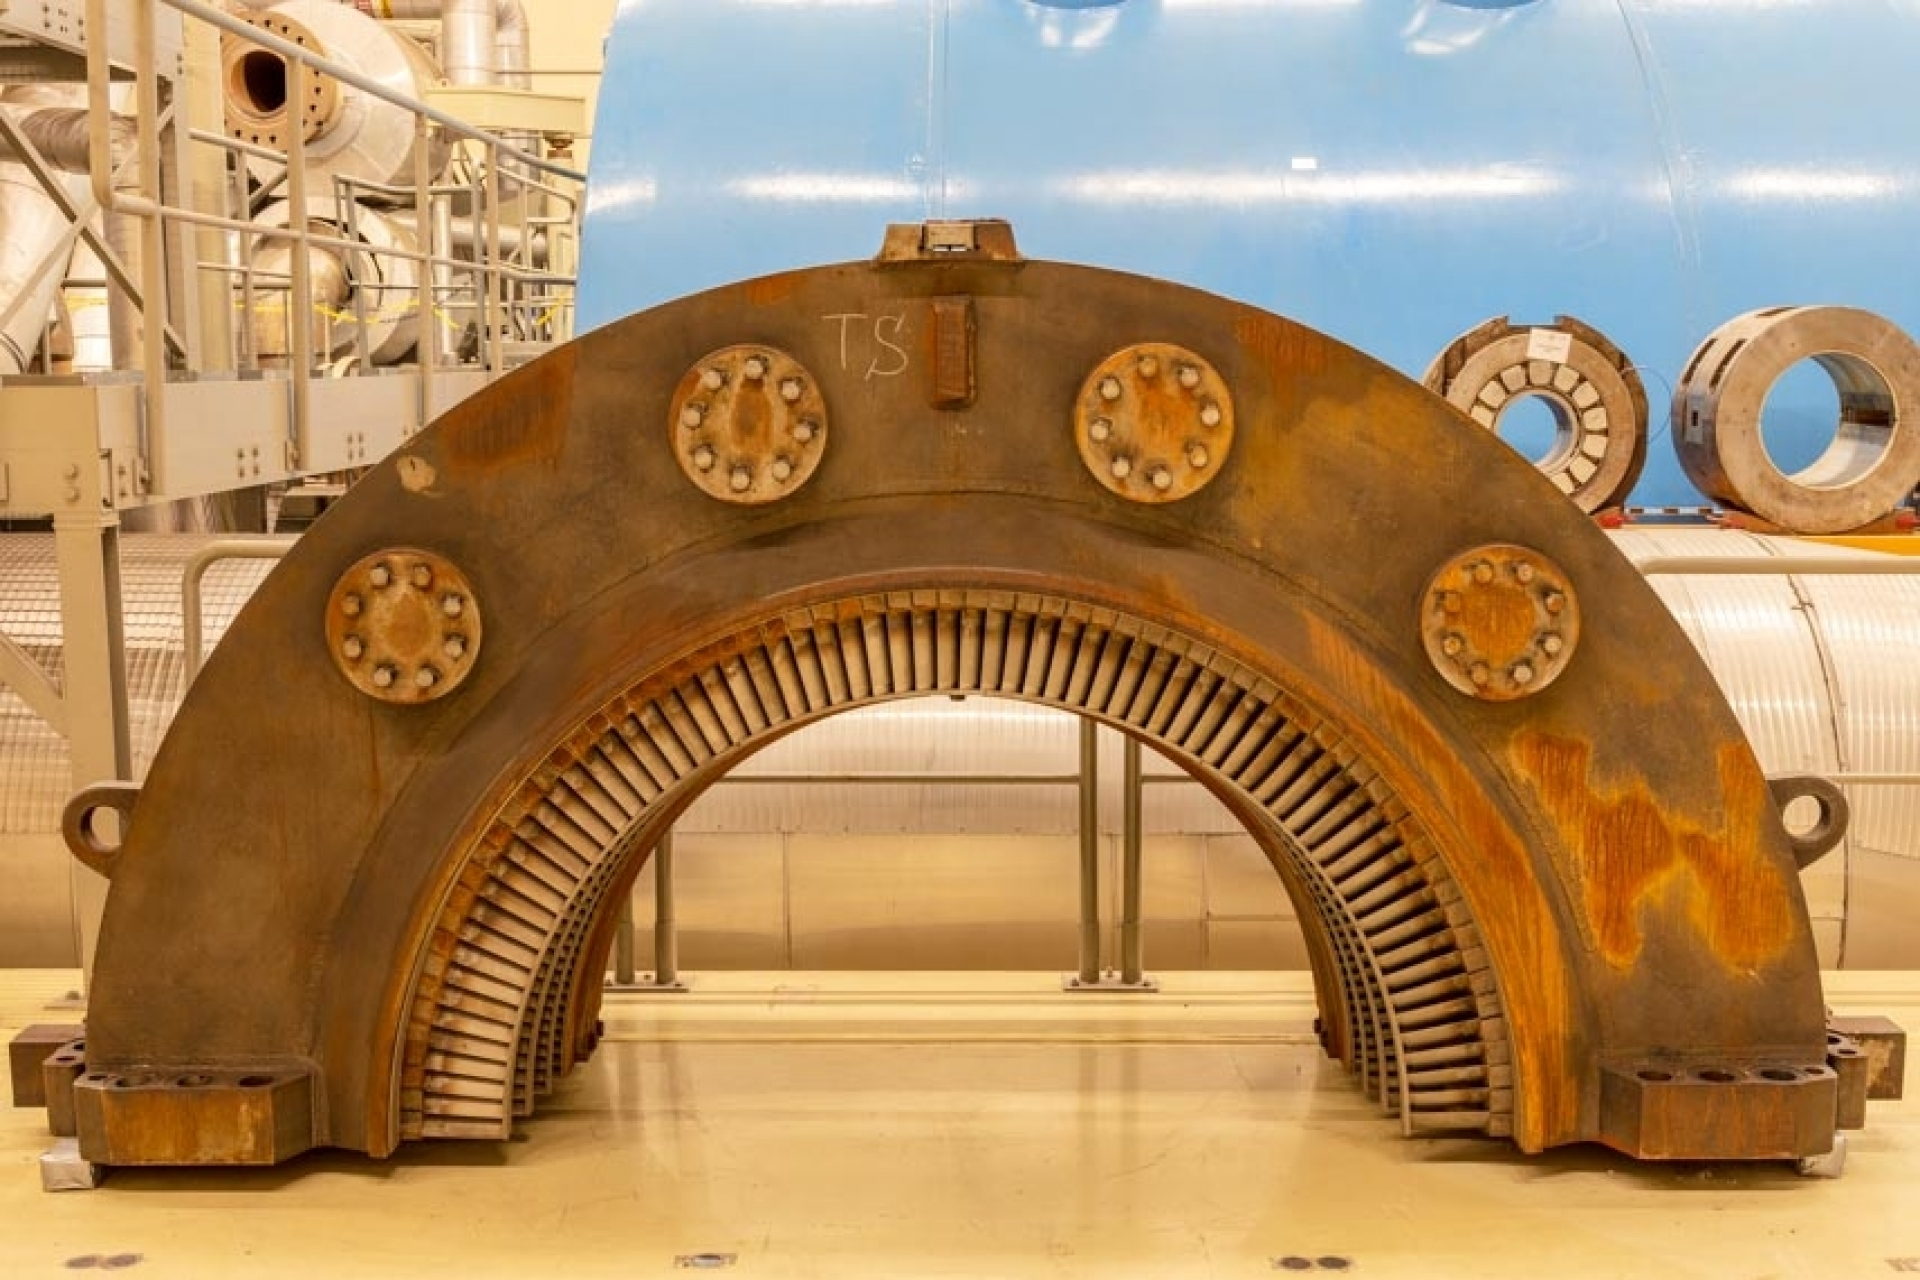 Fotokurs im Atomkraftwerk Zwentendorf - Canon Academy Spezialthemen